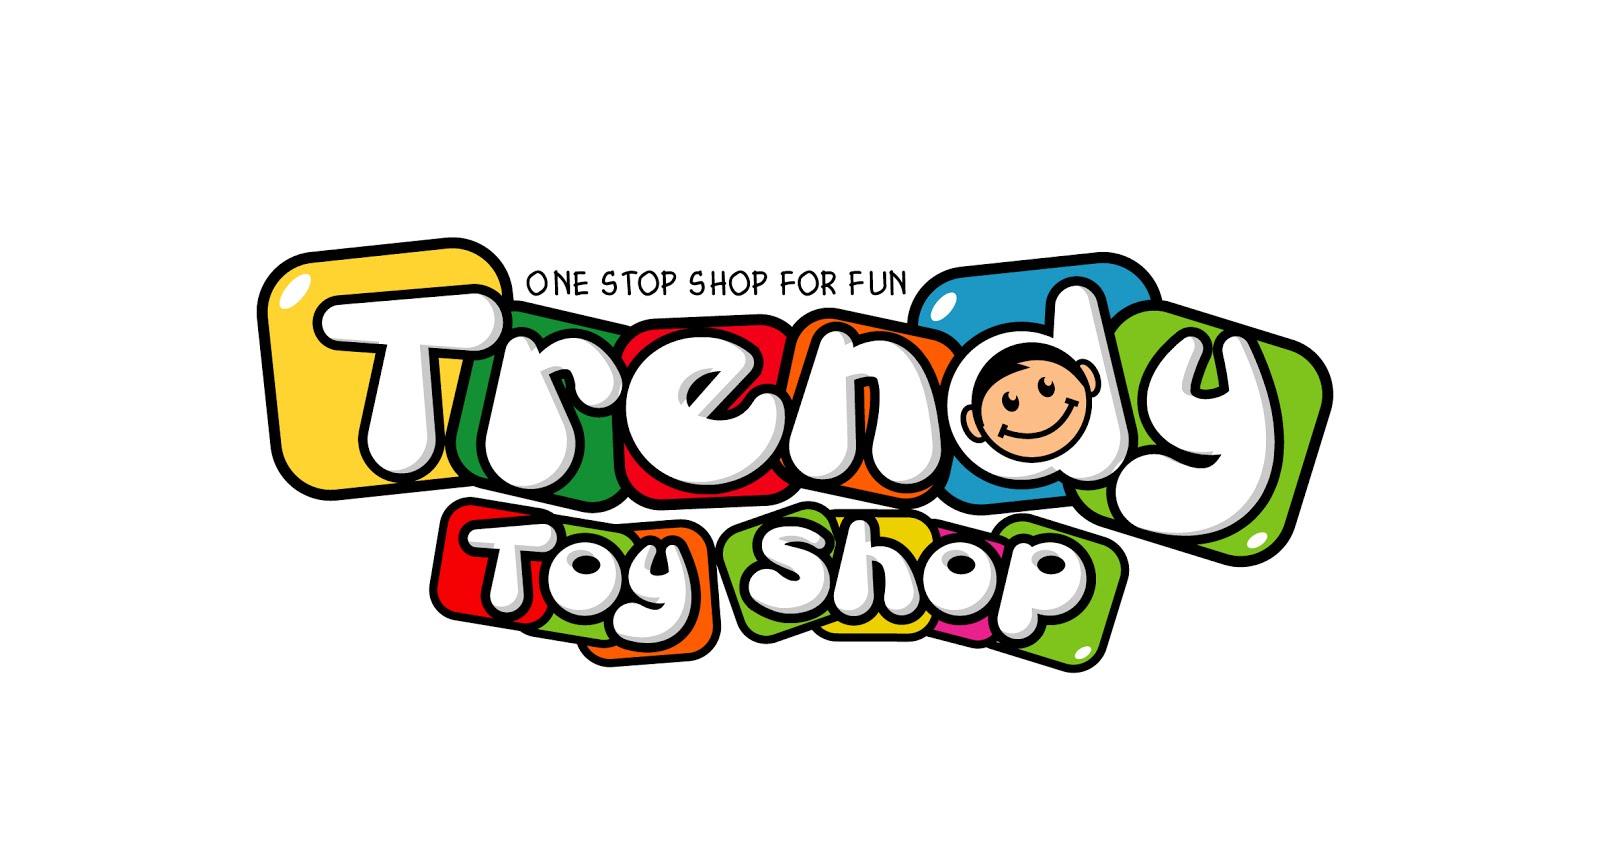 TRENDY TOY SHOP